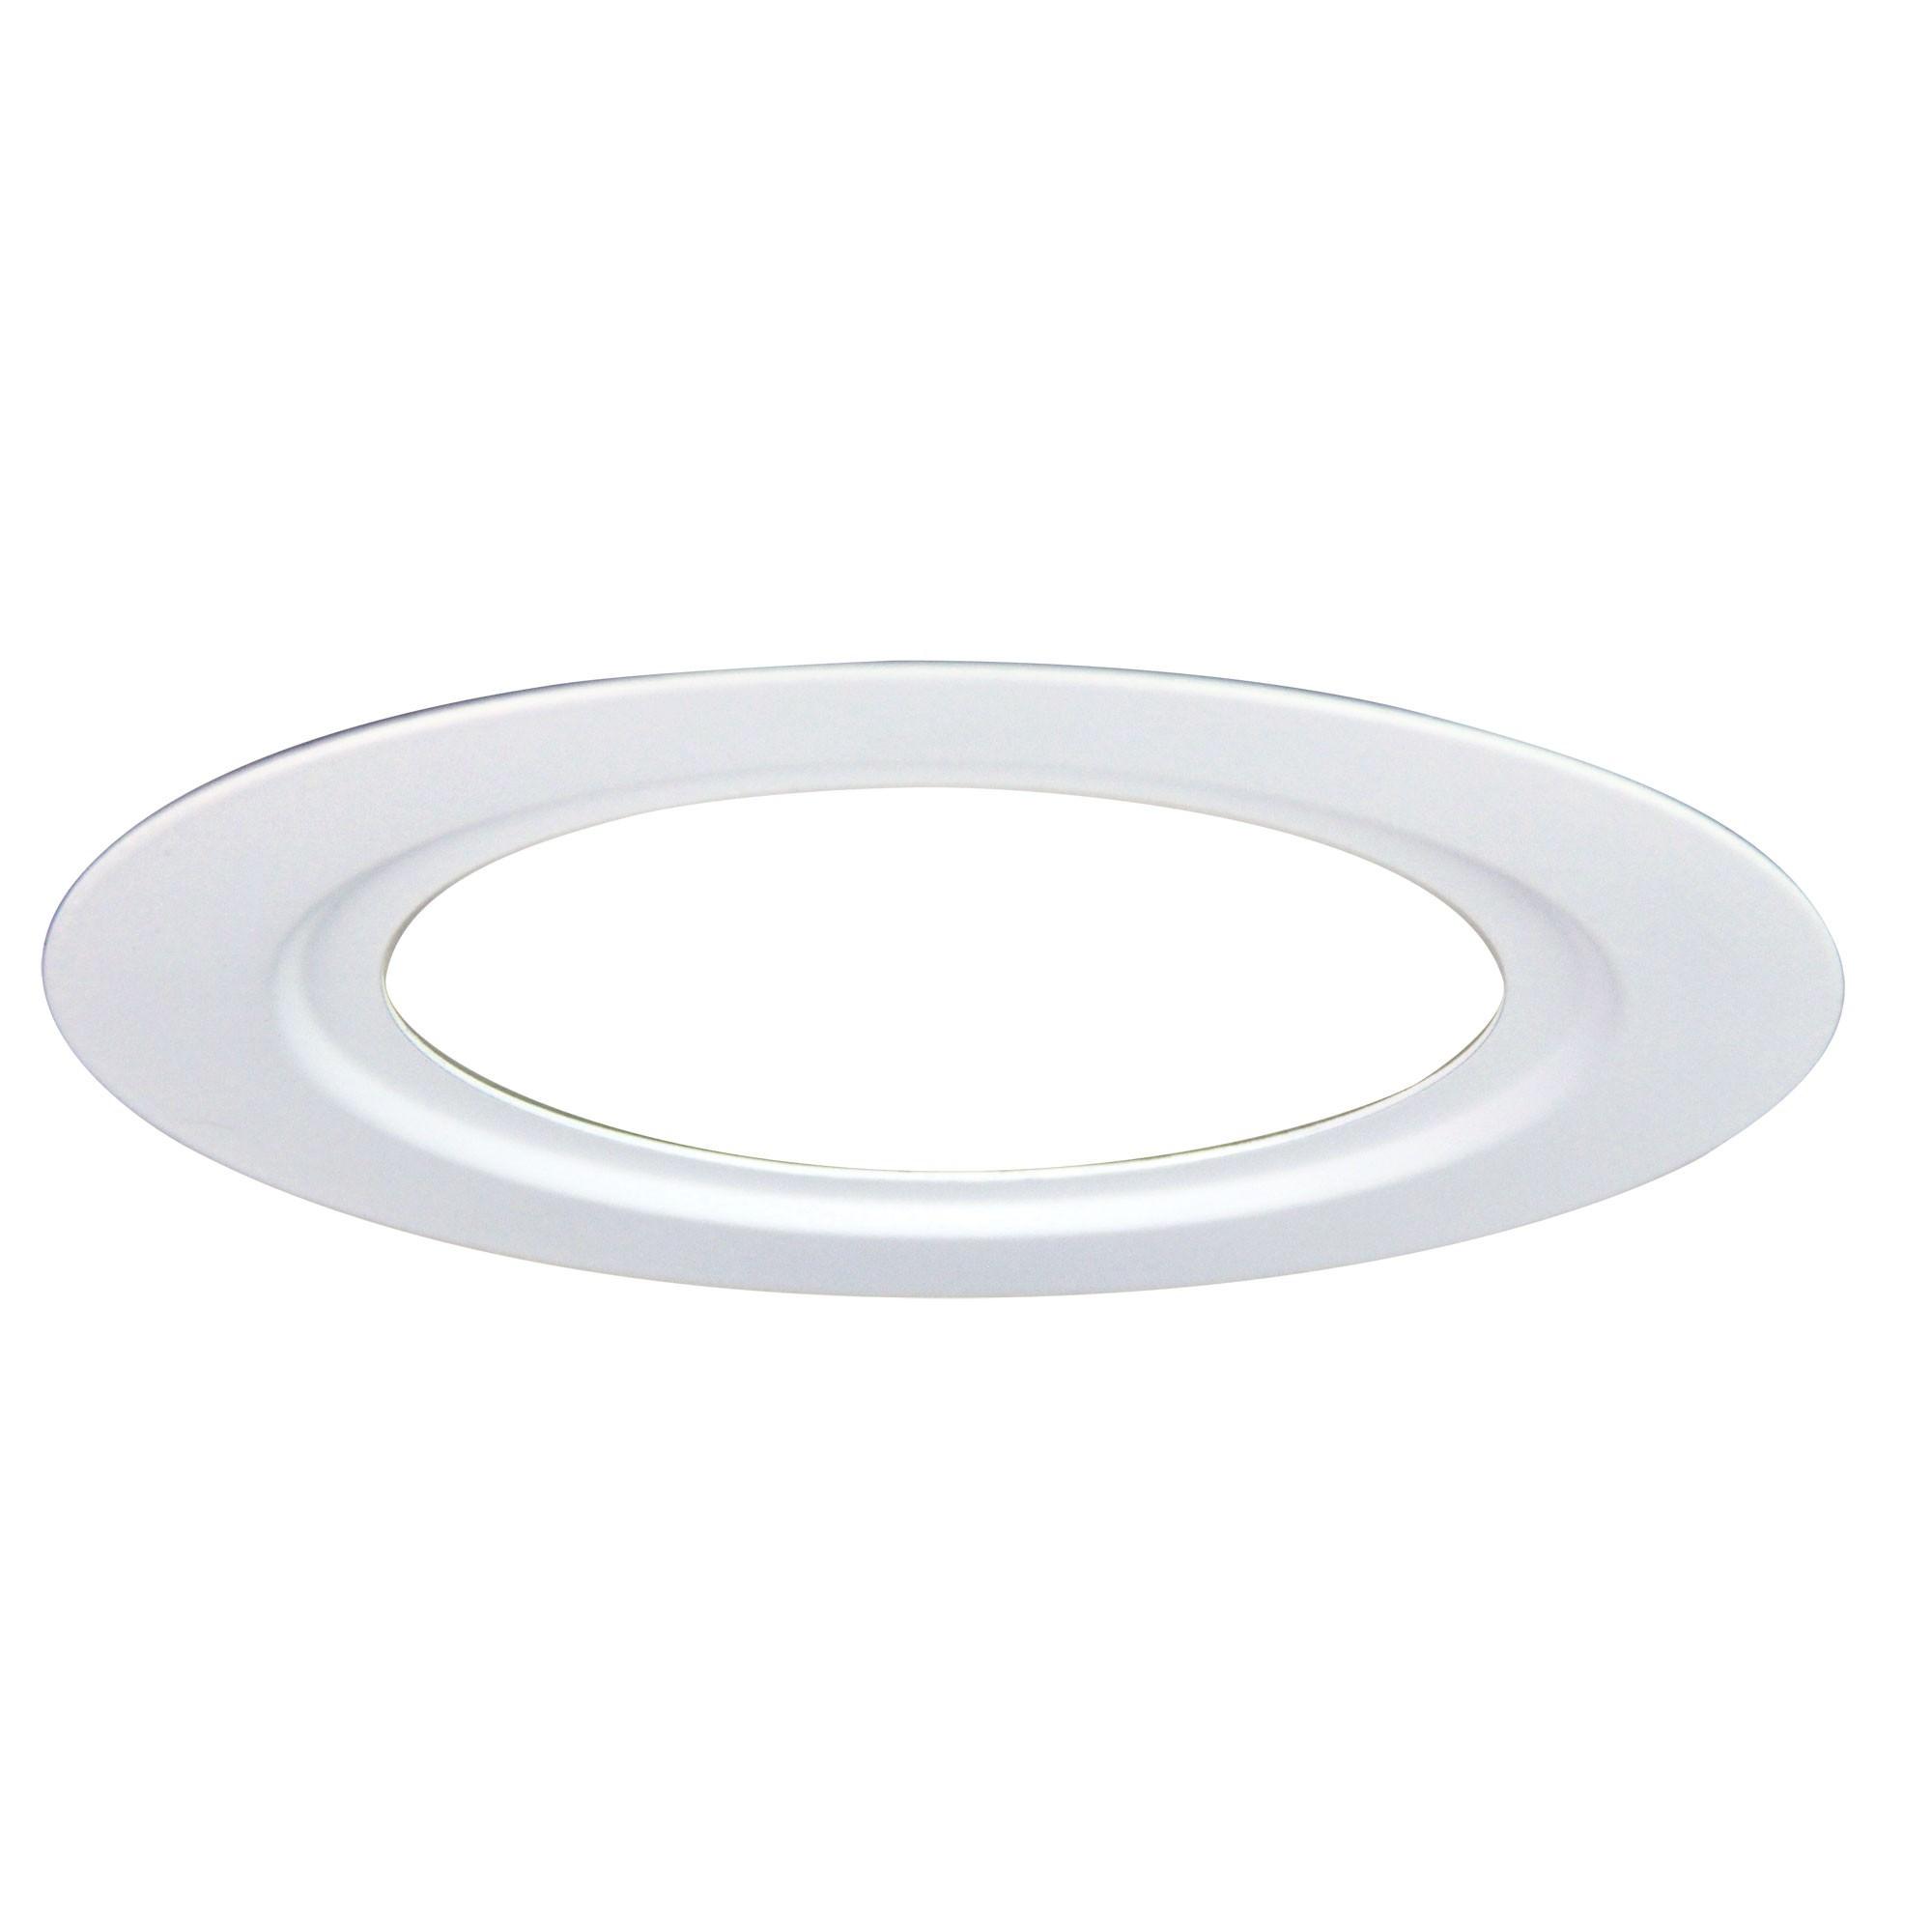 Gamma / Theta Downlight Ceiling Converter Plate